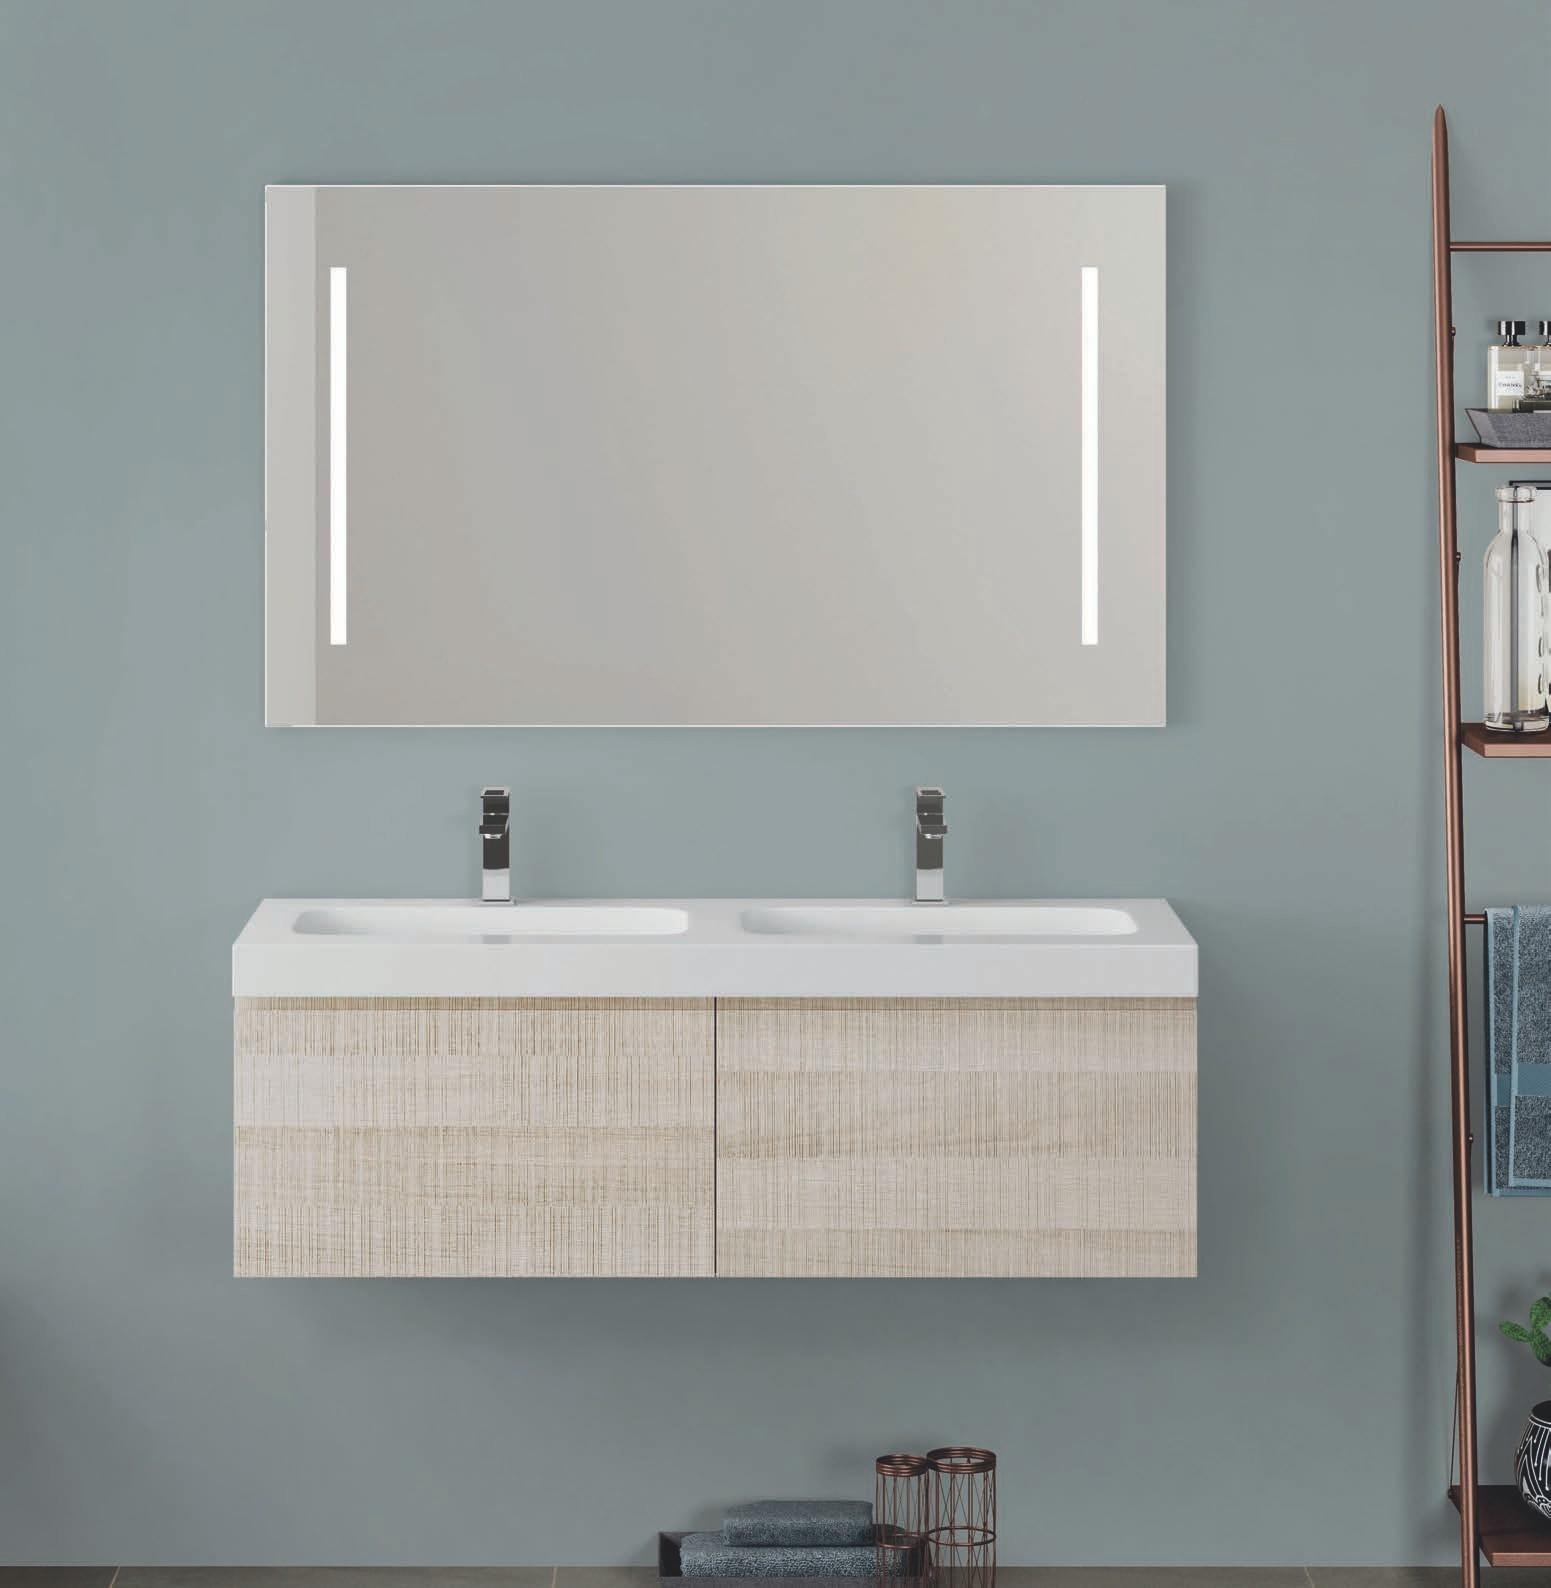 Espejo retroiluminado led sc mobiliario - Espejo retroiluminado bano ...